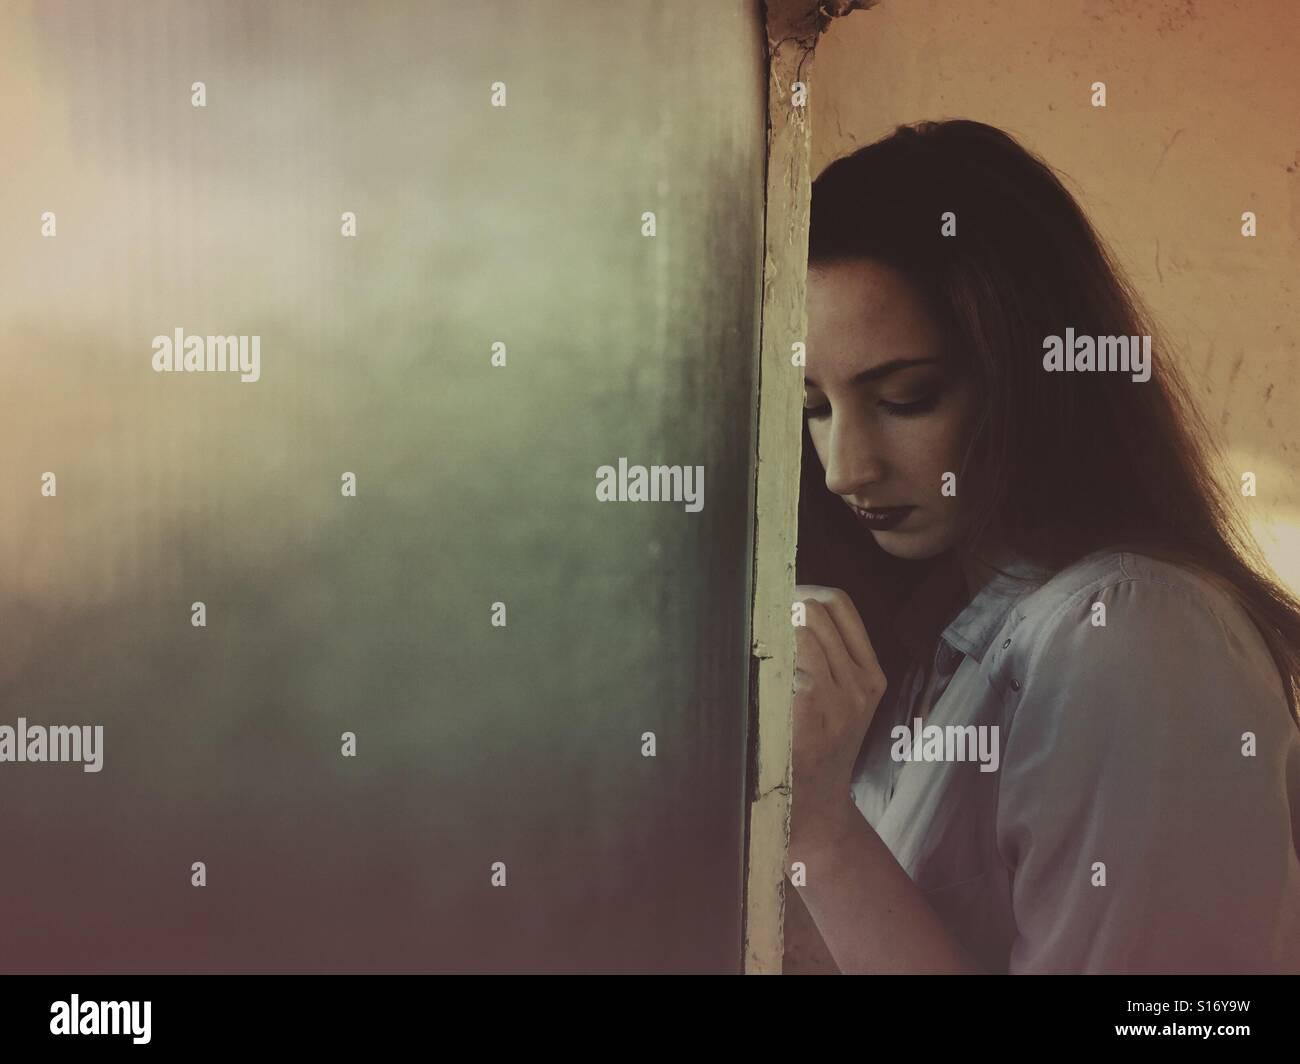 Sad woman by the window - Stock Image